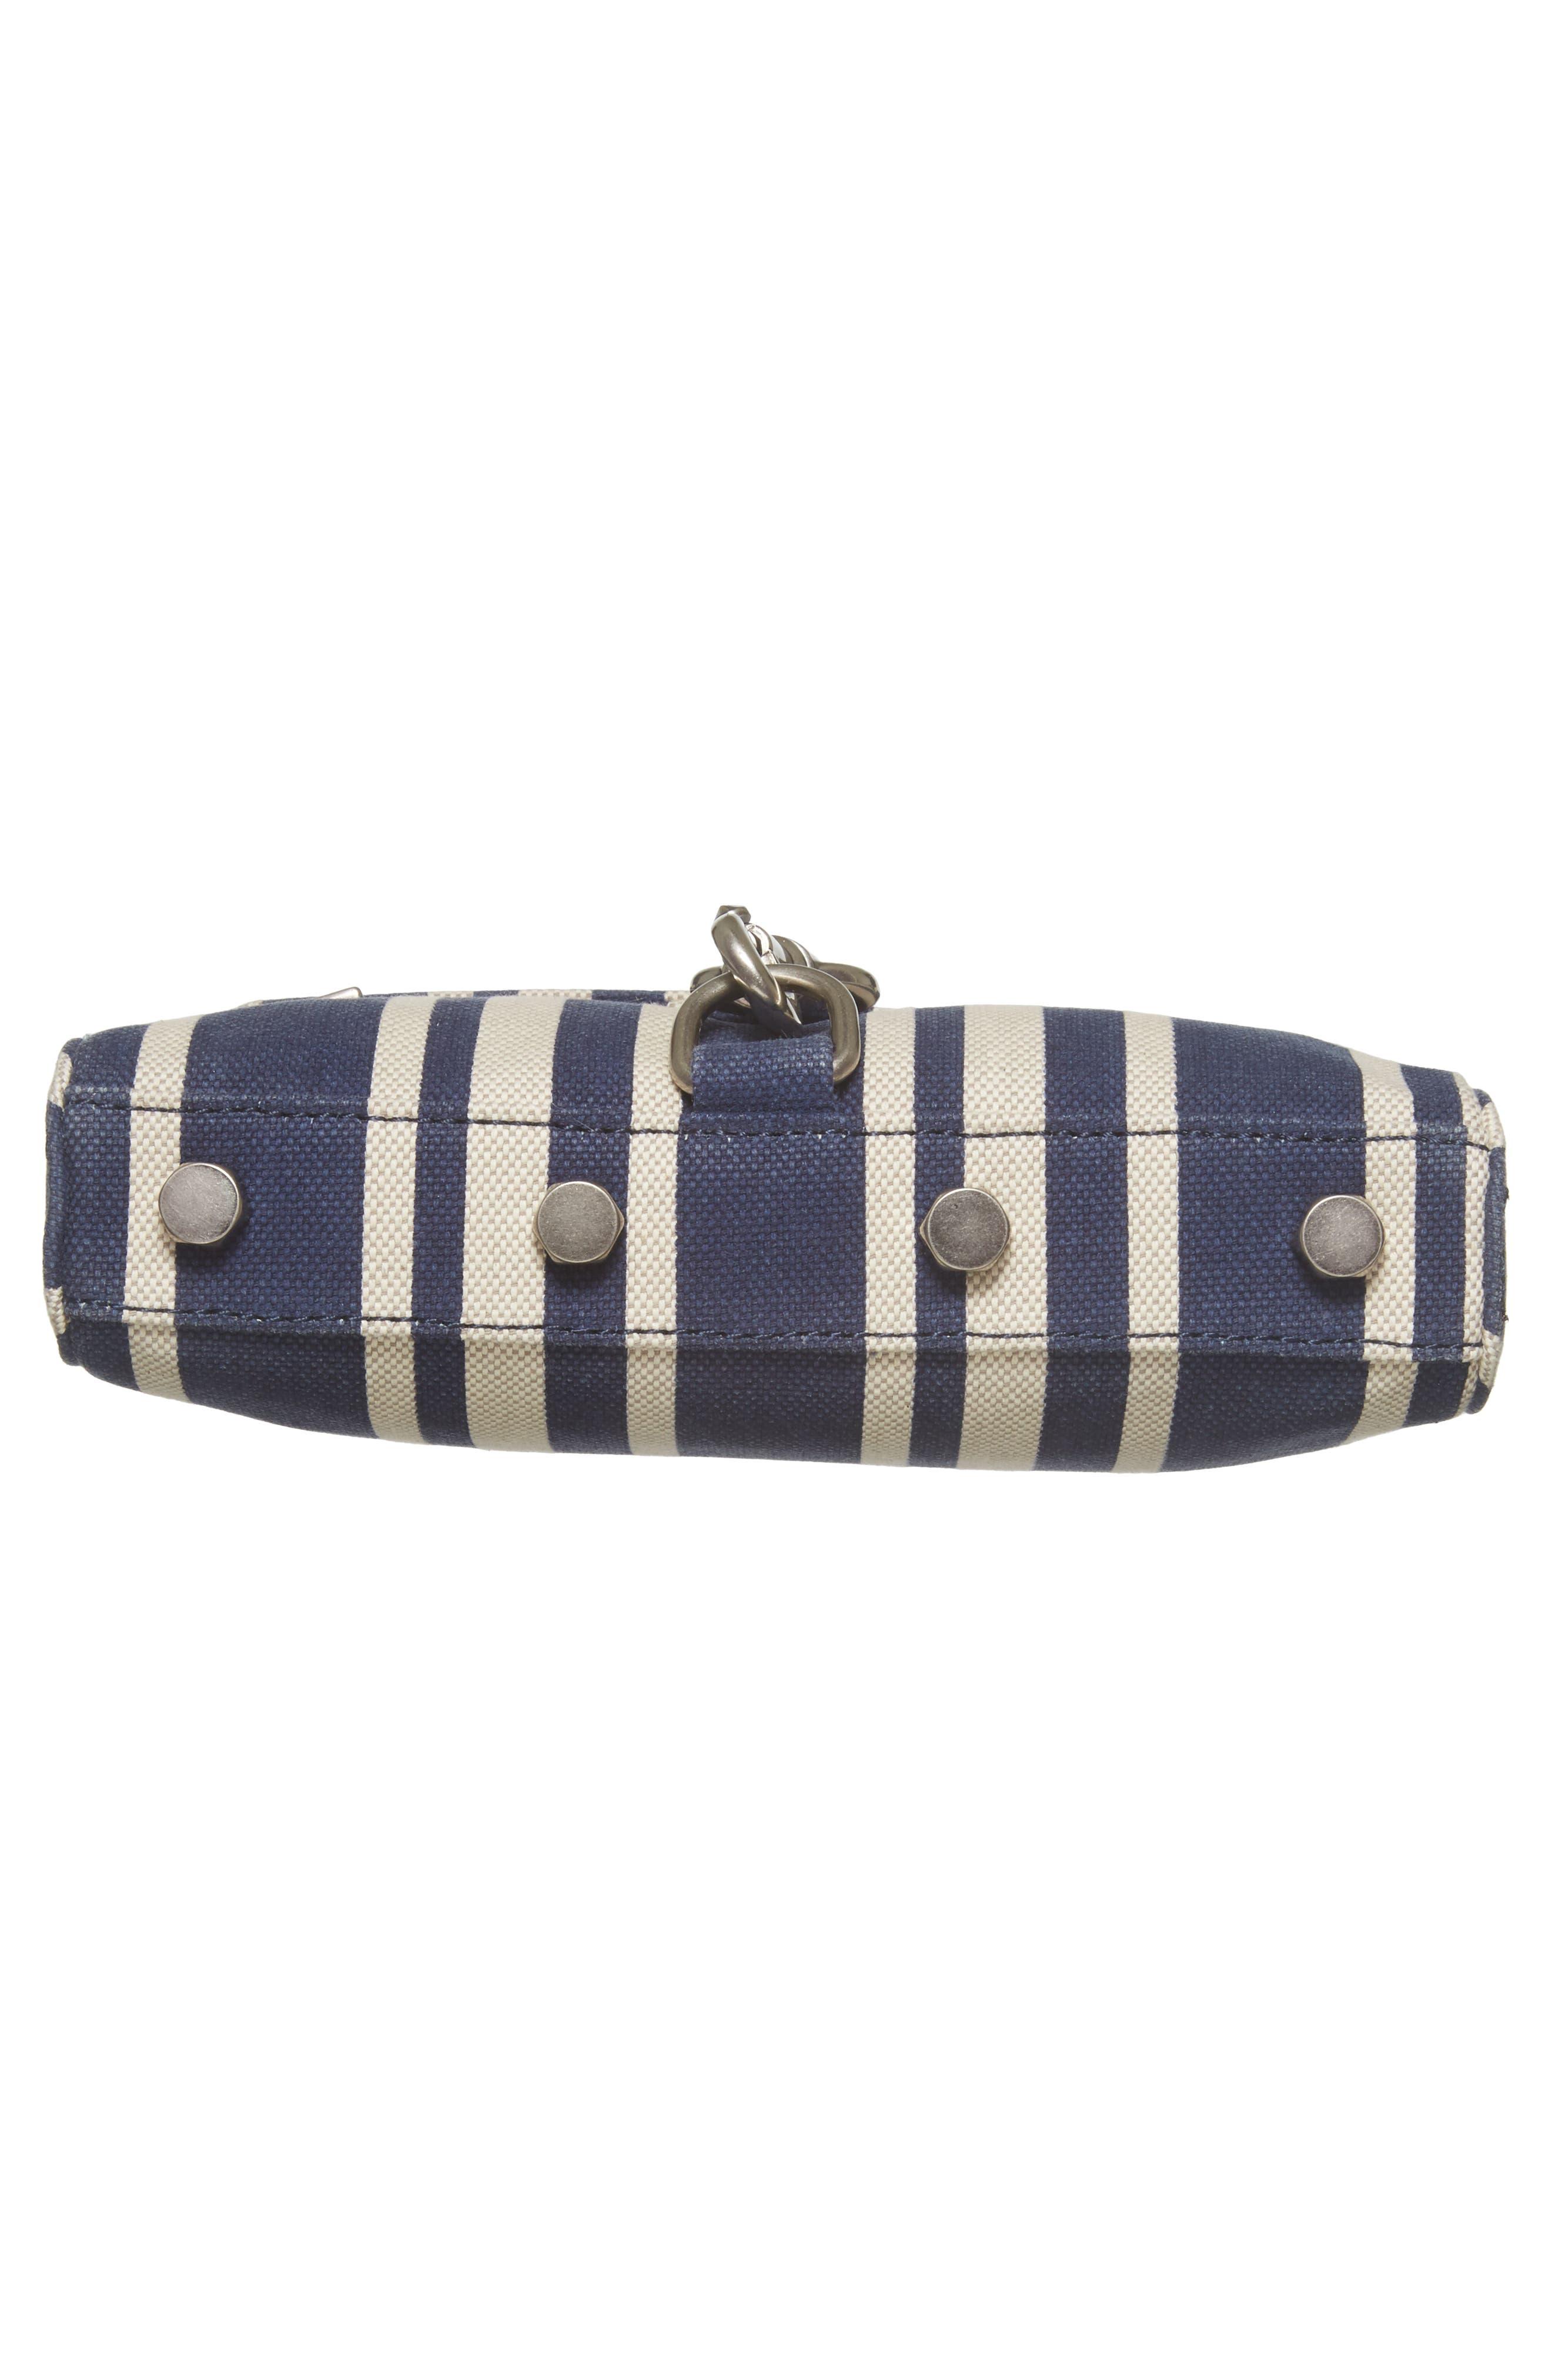 Mini MAC Stripe Canvas Convertible Crossbody Bag,                             Alternate thumbnail 6, color,                             Navy Stripe